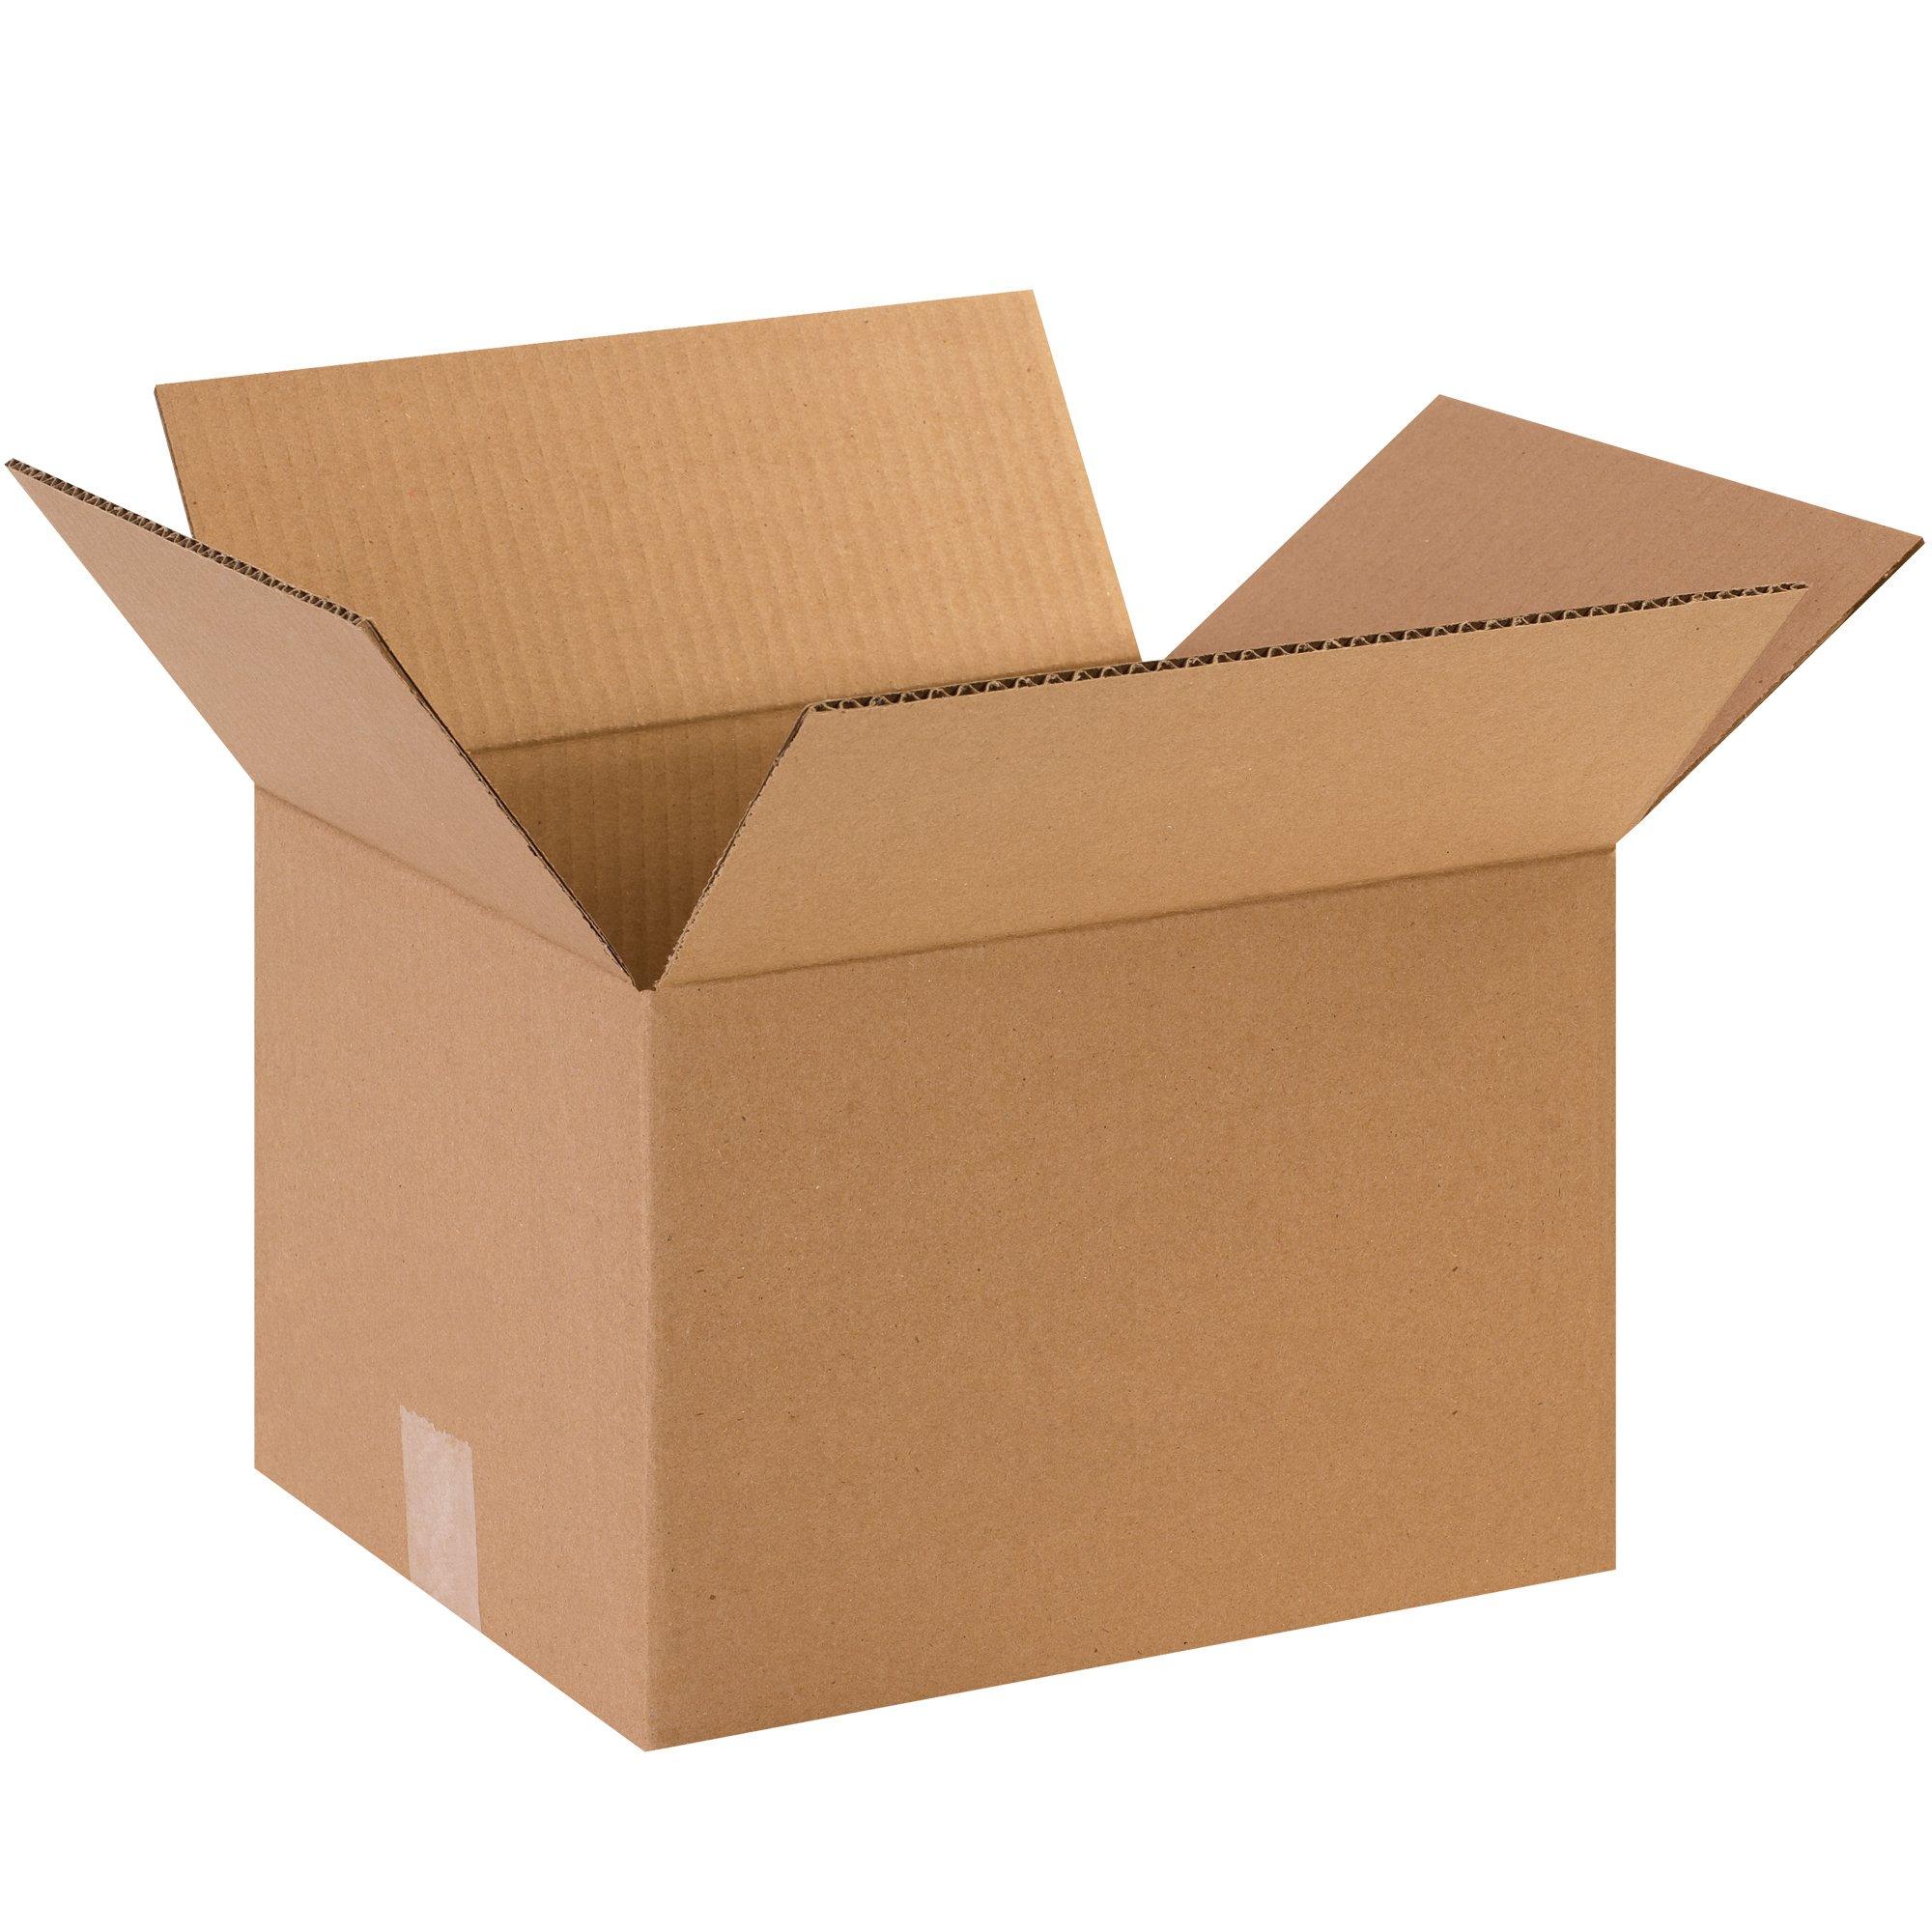 BOX USA B121081000PK Corrugated Boxes, 12''L x 10''W x 8''H, Kraft (Pack of 1000)